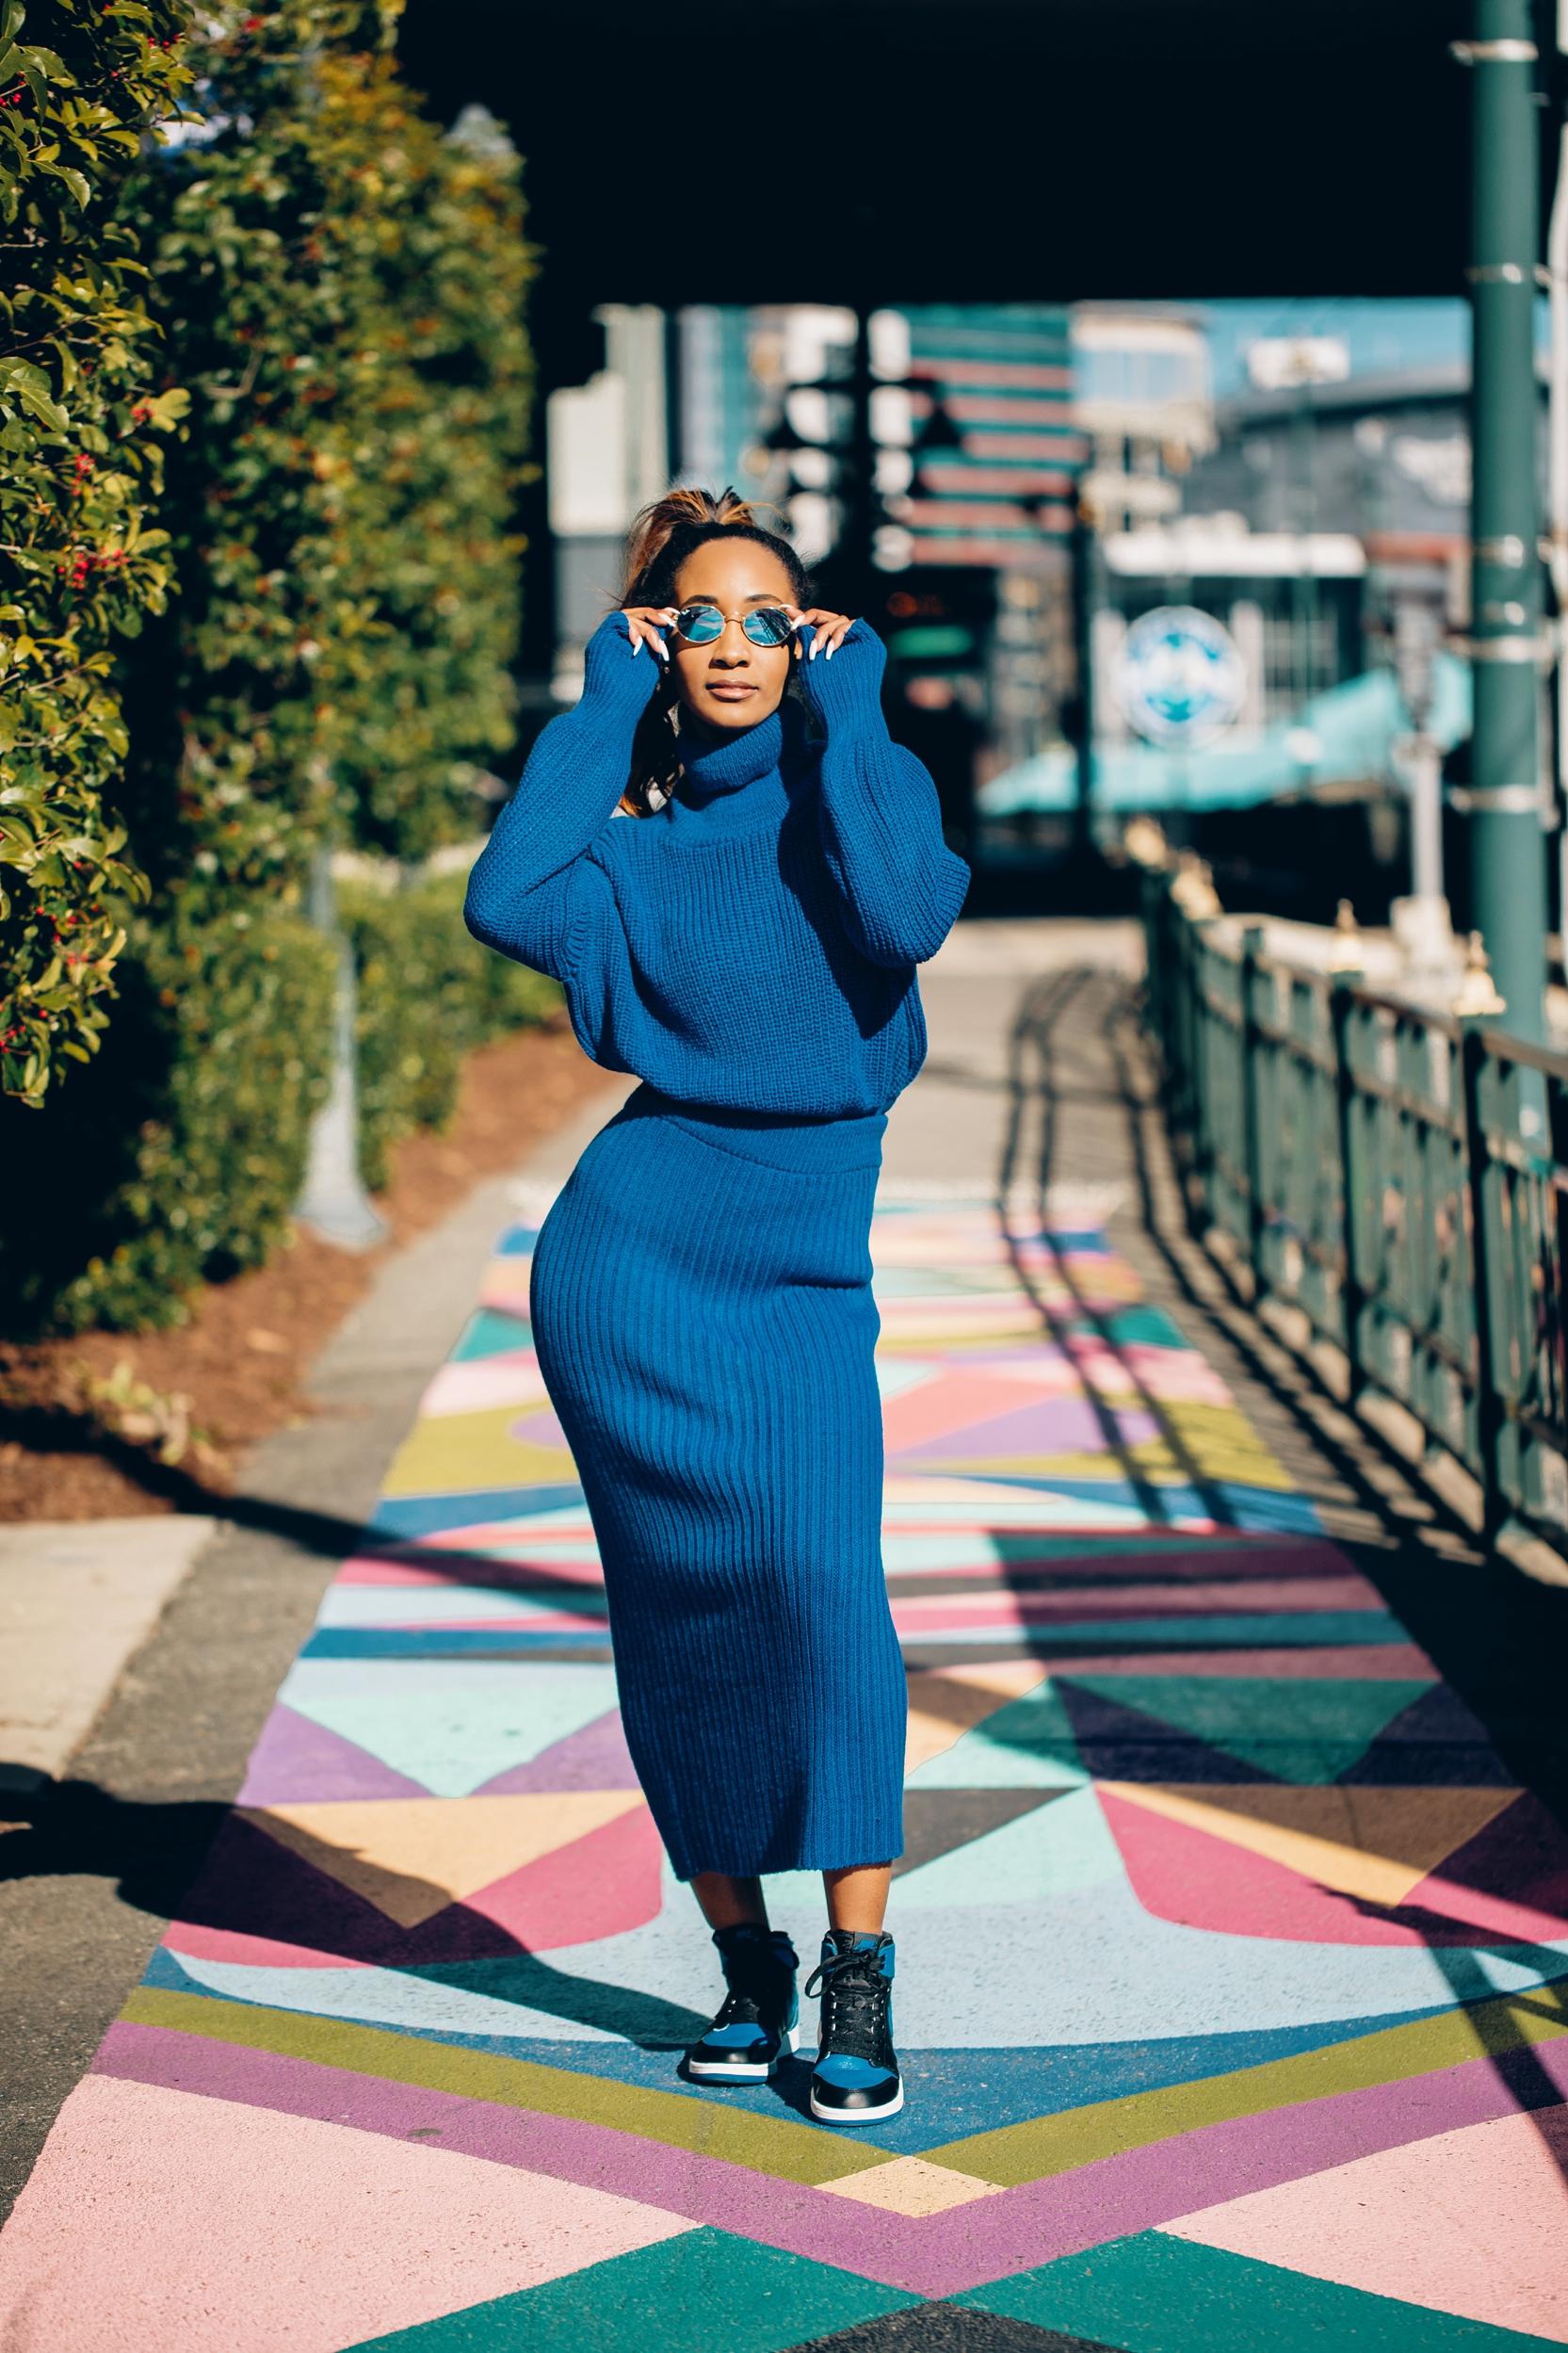 Charlotte_Fashion_Photographer_0020.jpg